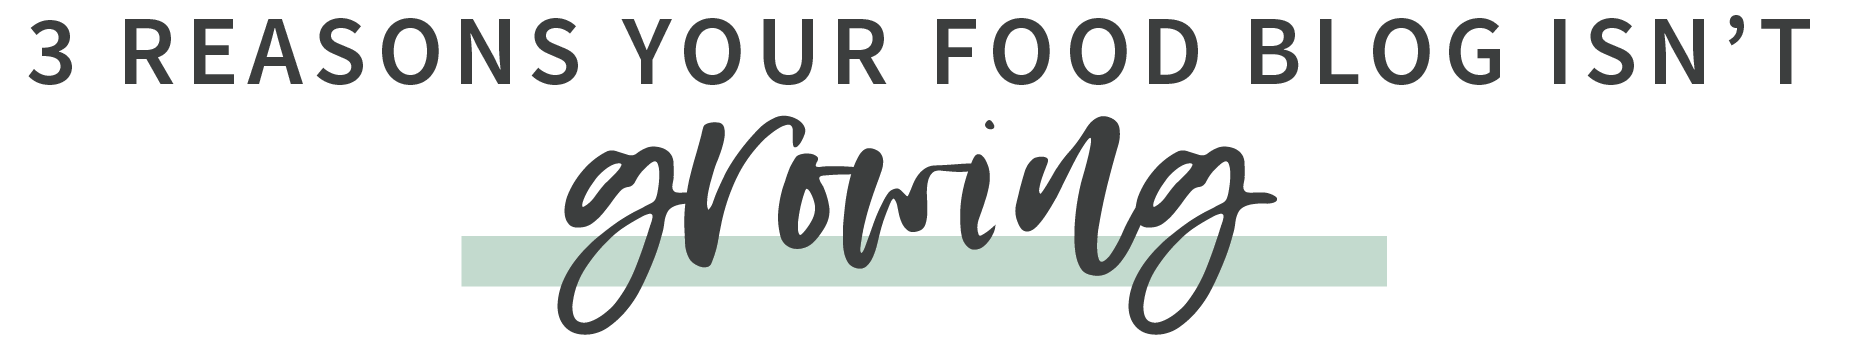 grow-your-food-blog-mint